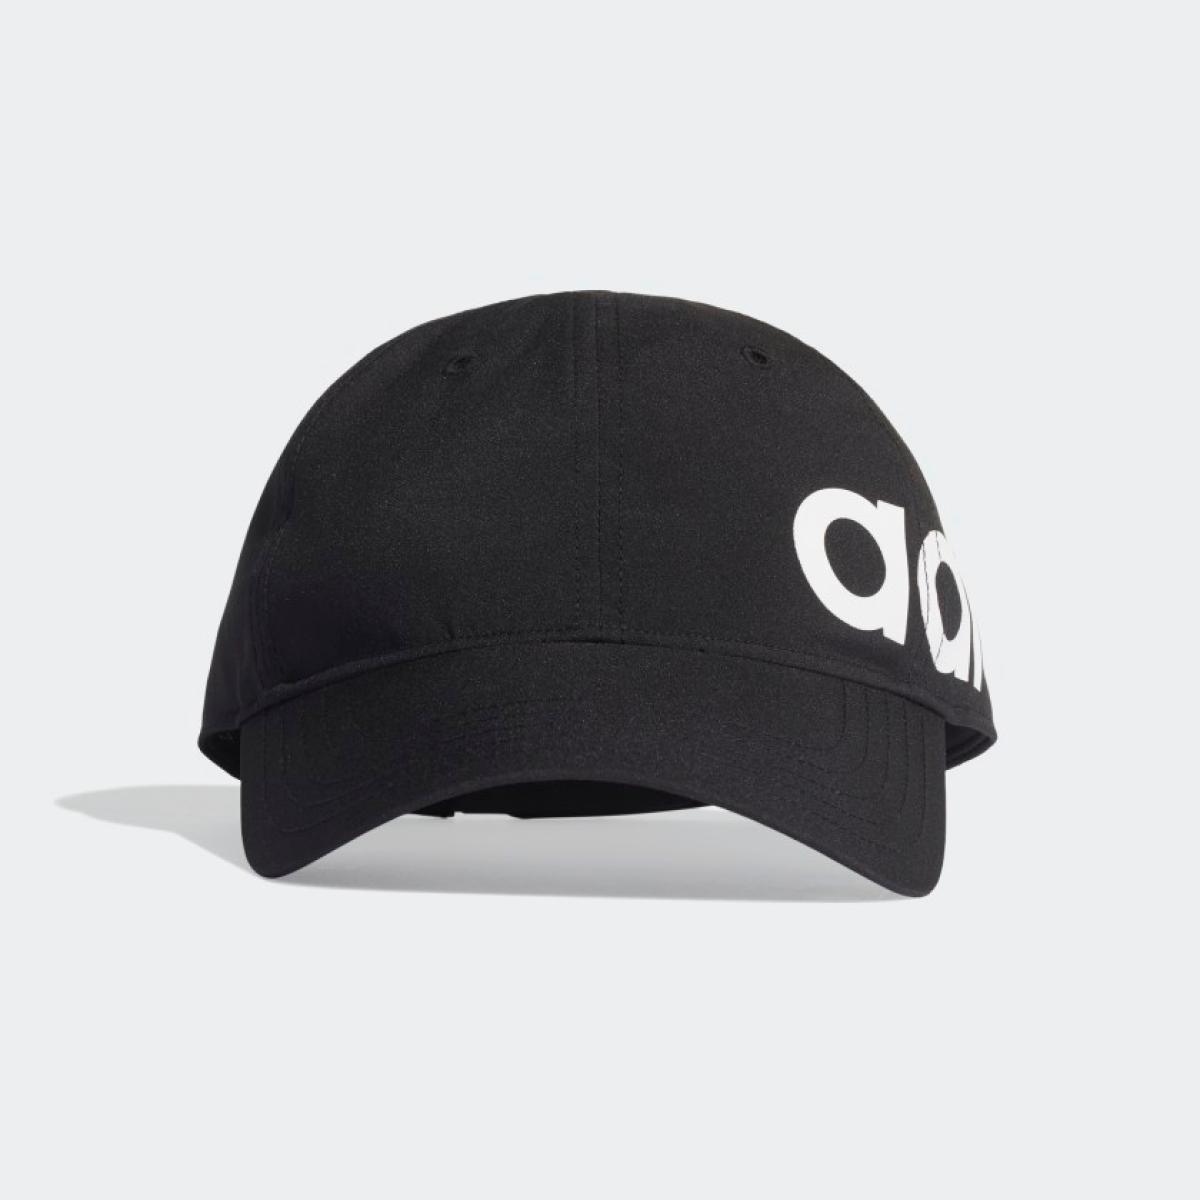 Boné adidas logo linear dad hat preto